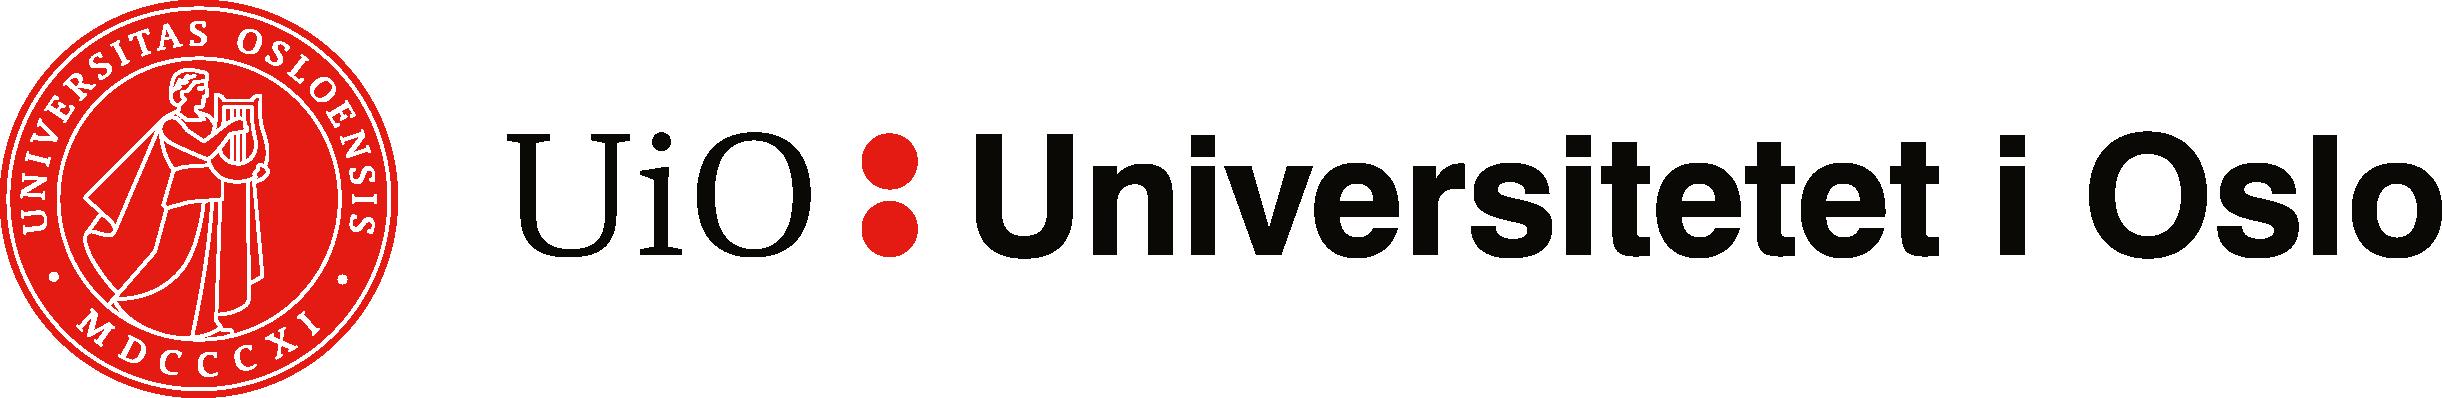 Oslo university logo